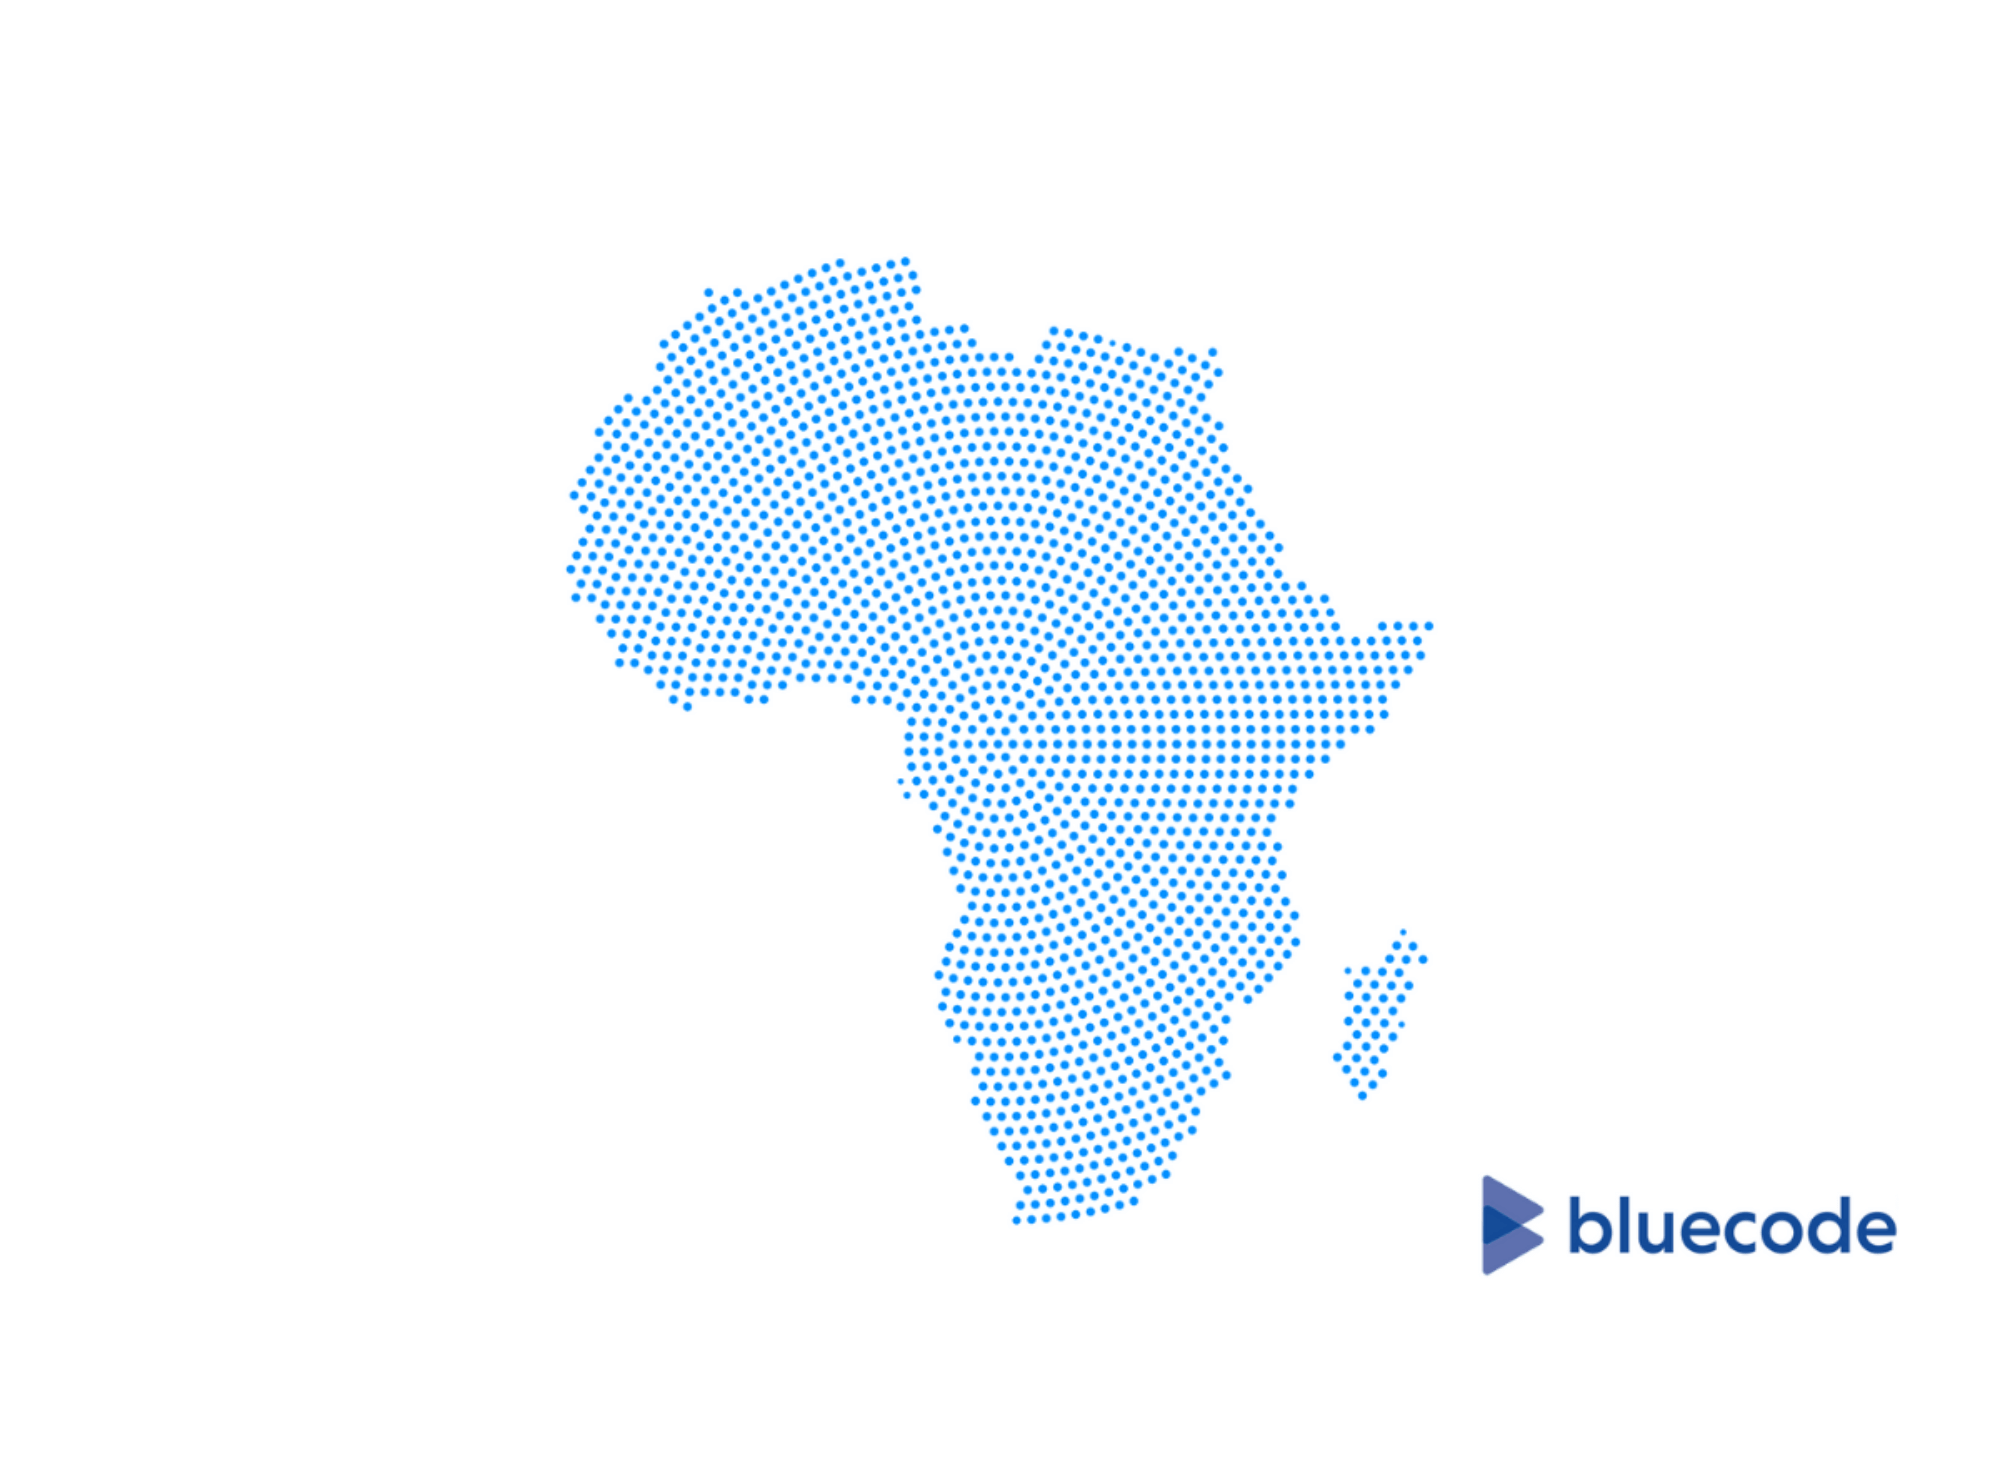 Bluecodeafrica2